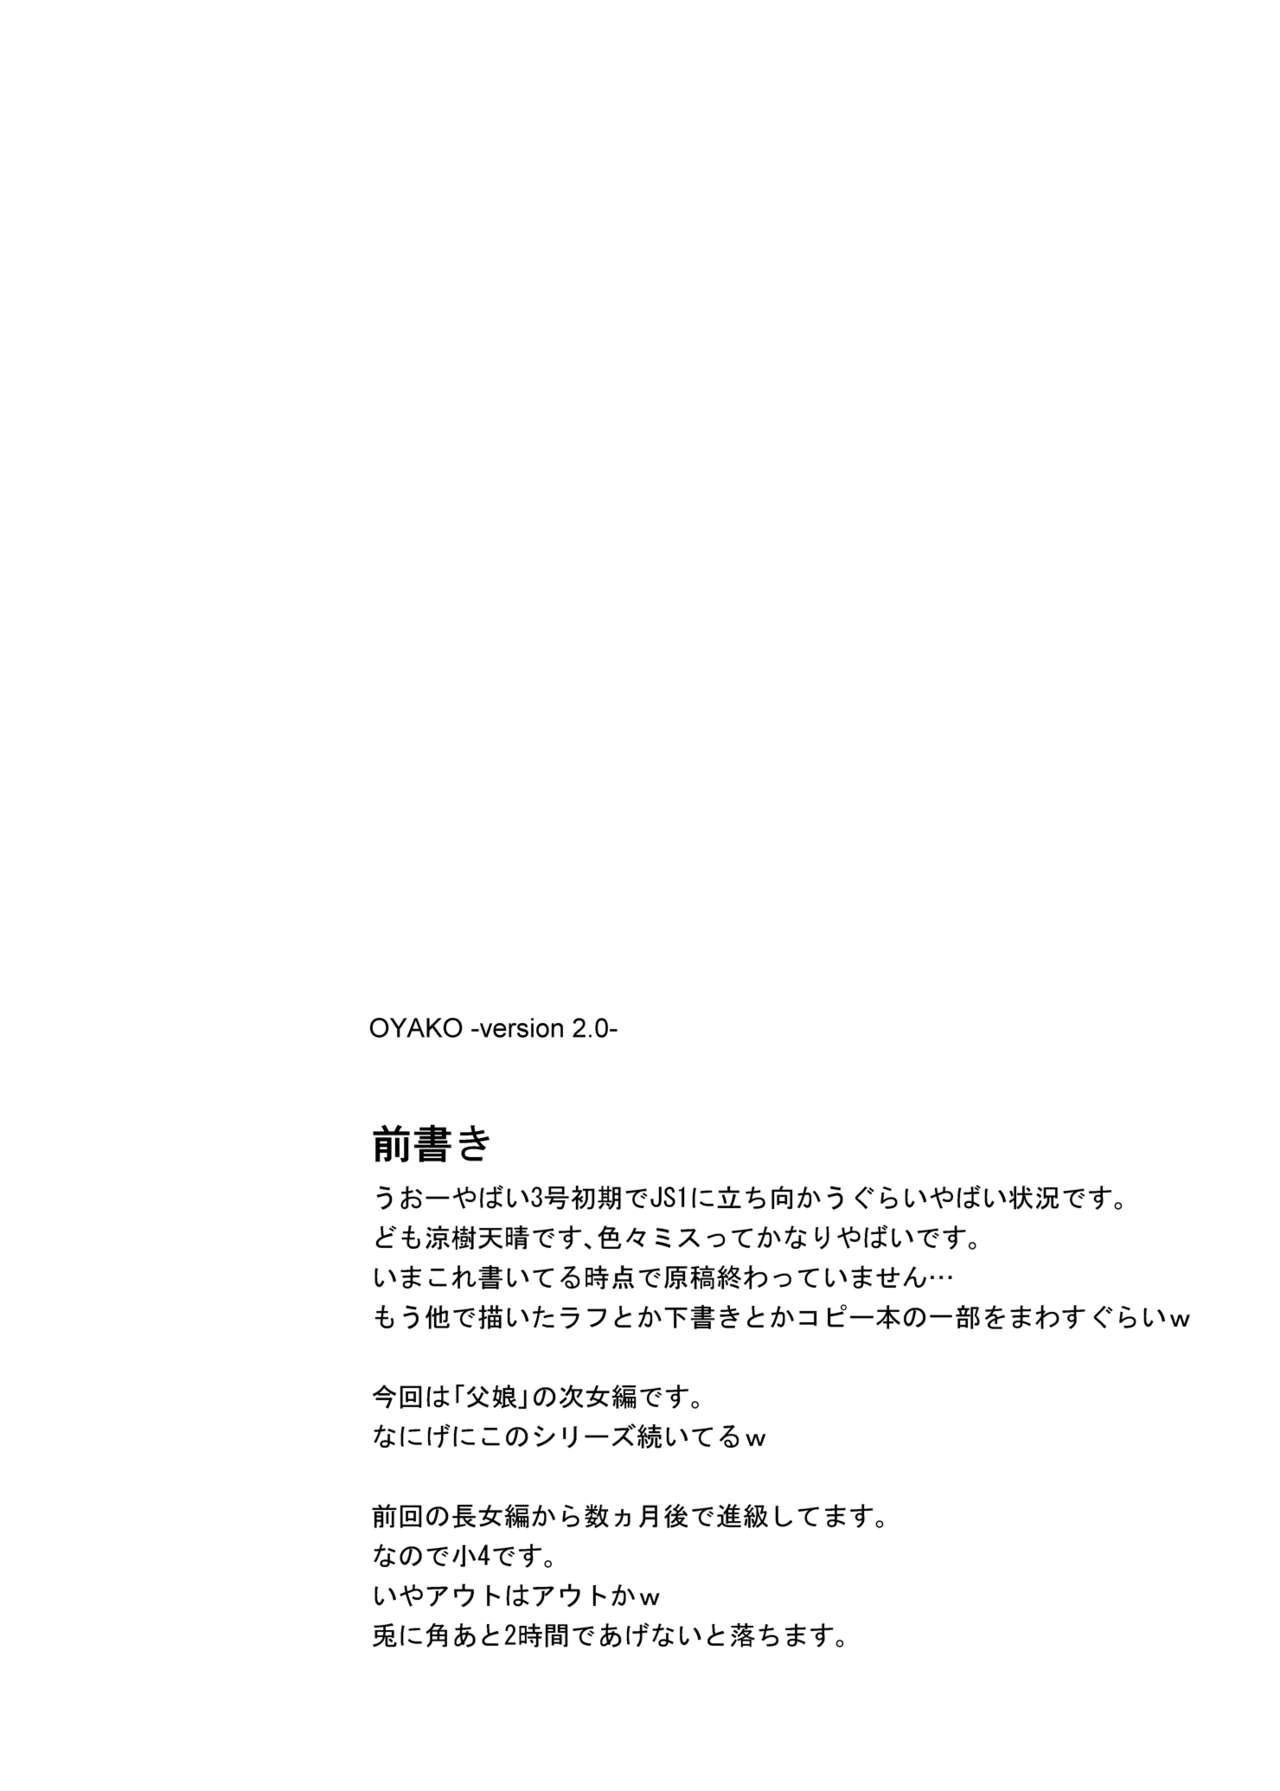 Oyako 2